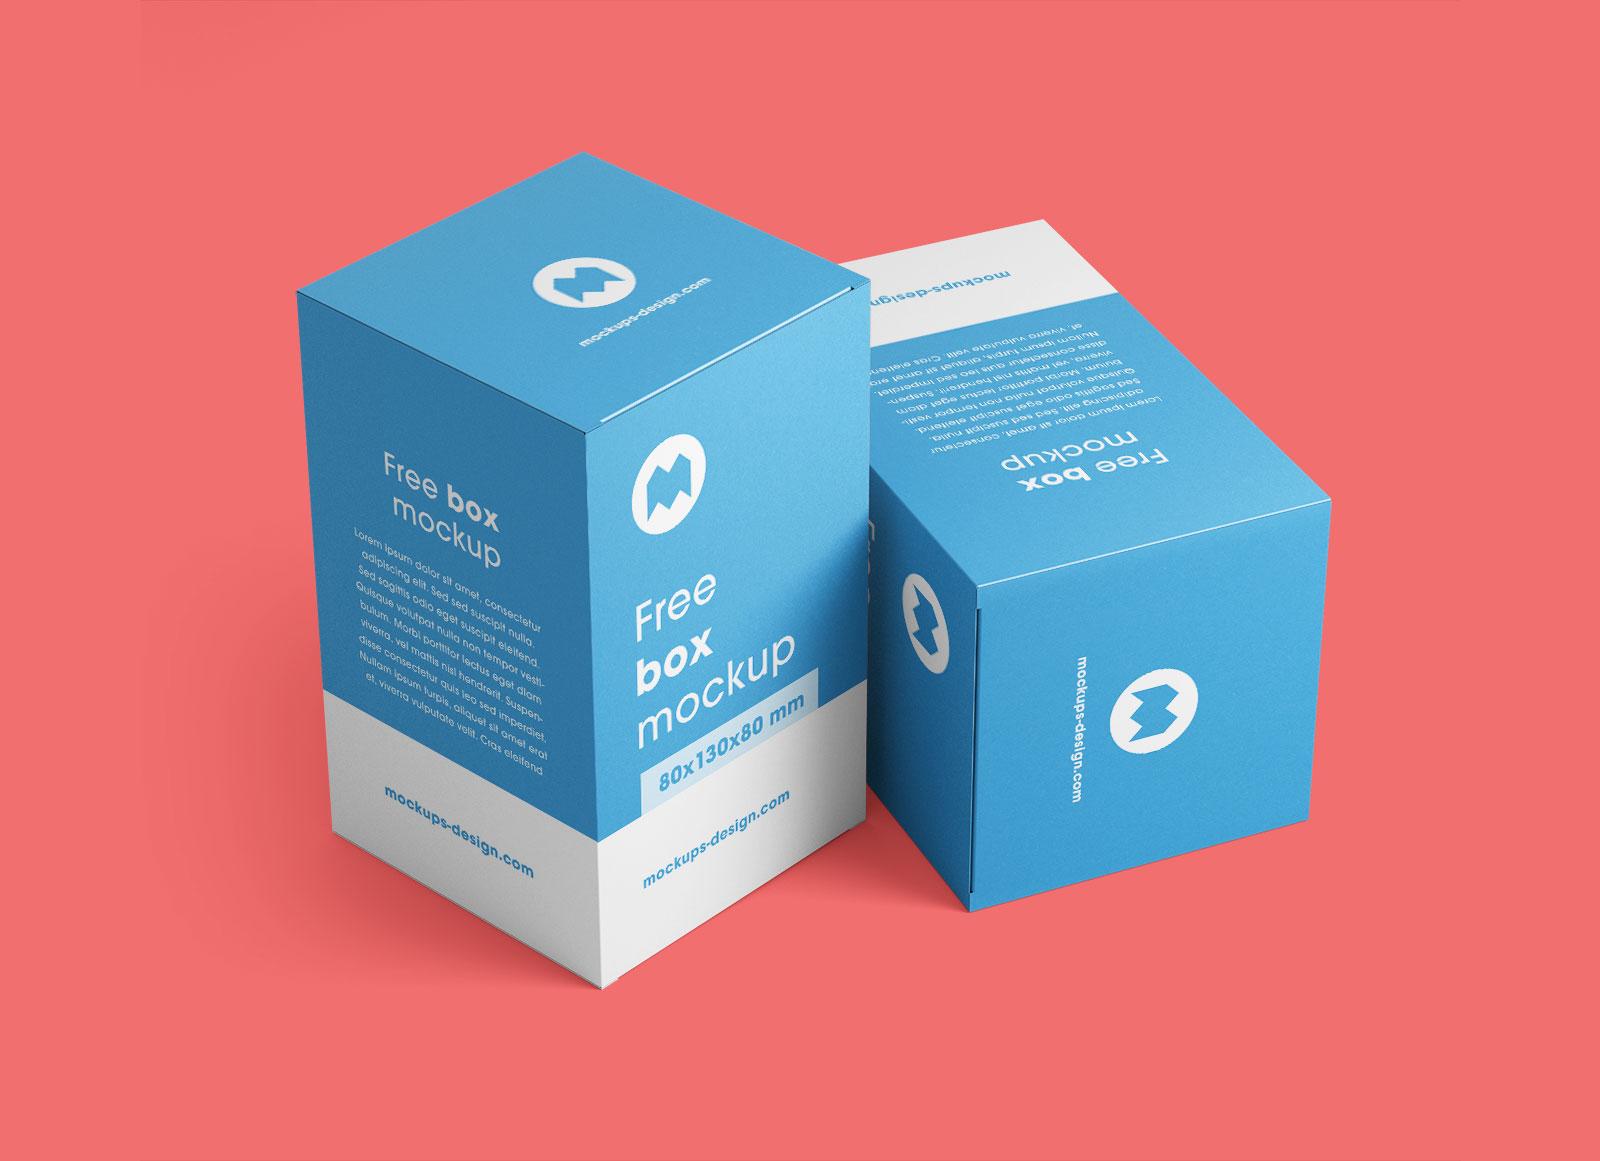 Free-Box-Packaging-Mockup-PSD-package (2)